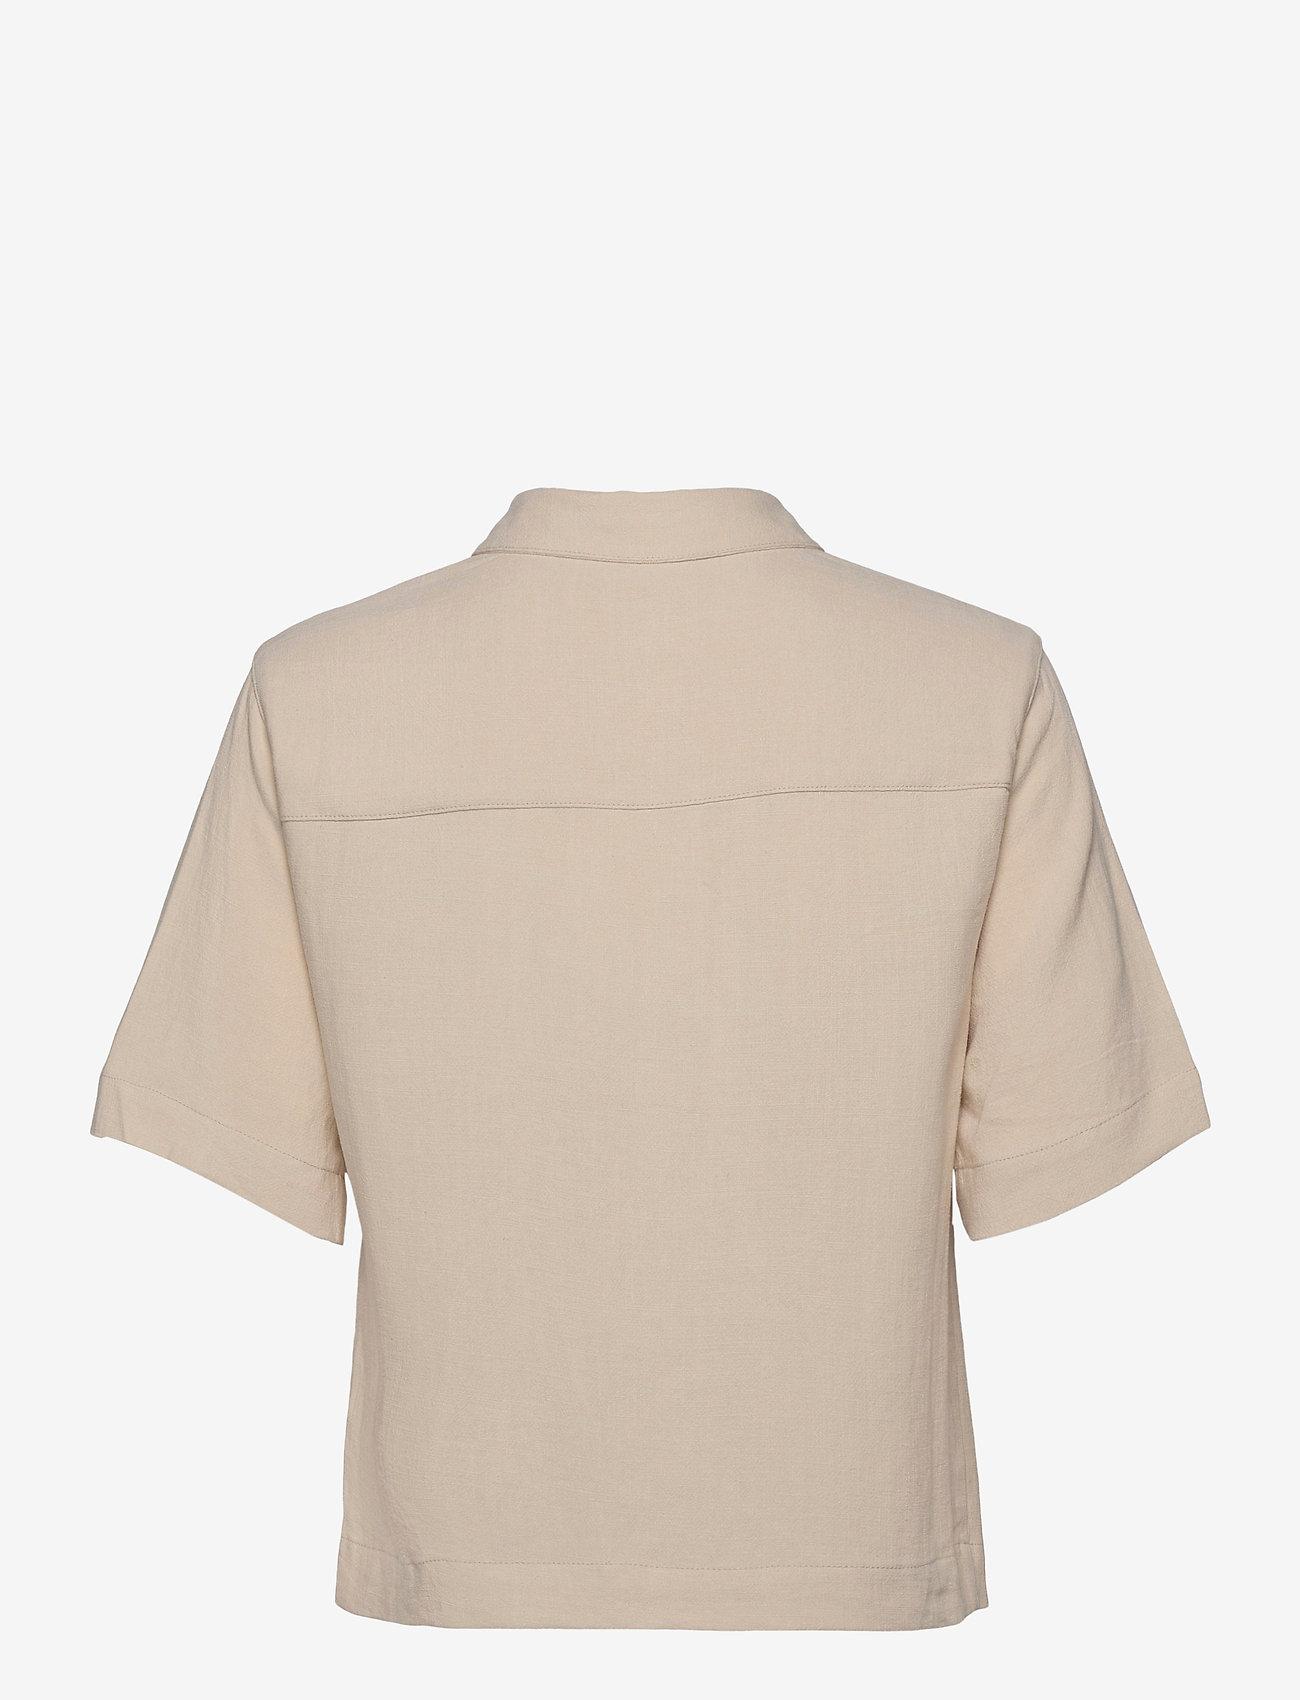 Object - OBJHADY 2/4 TOP - short-sleeved shirts - sandshell - 1